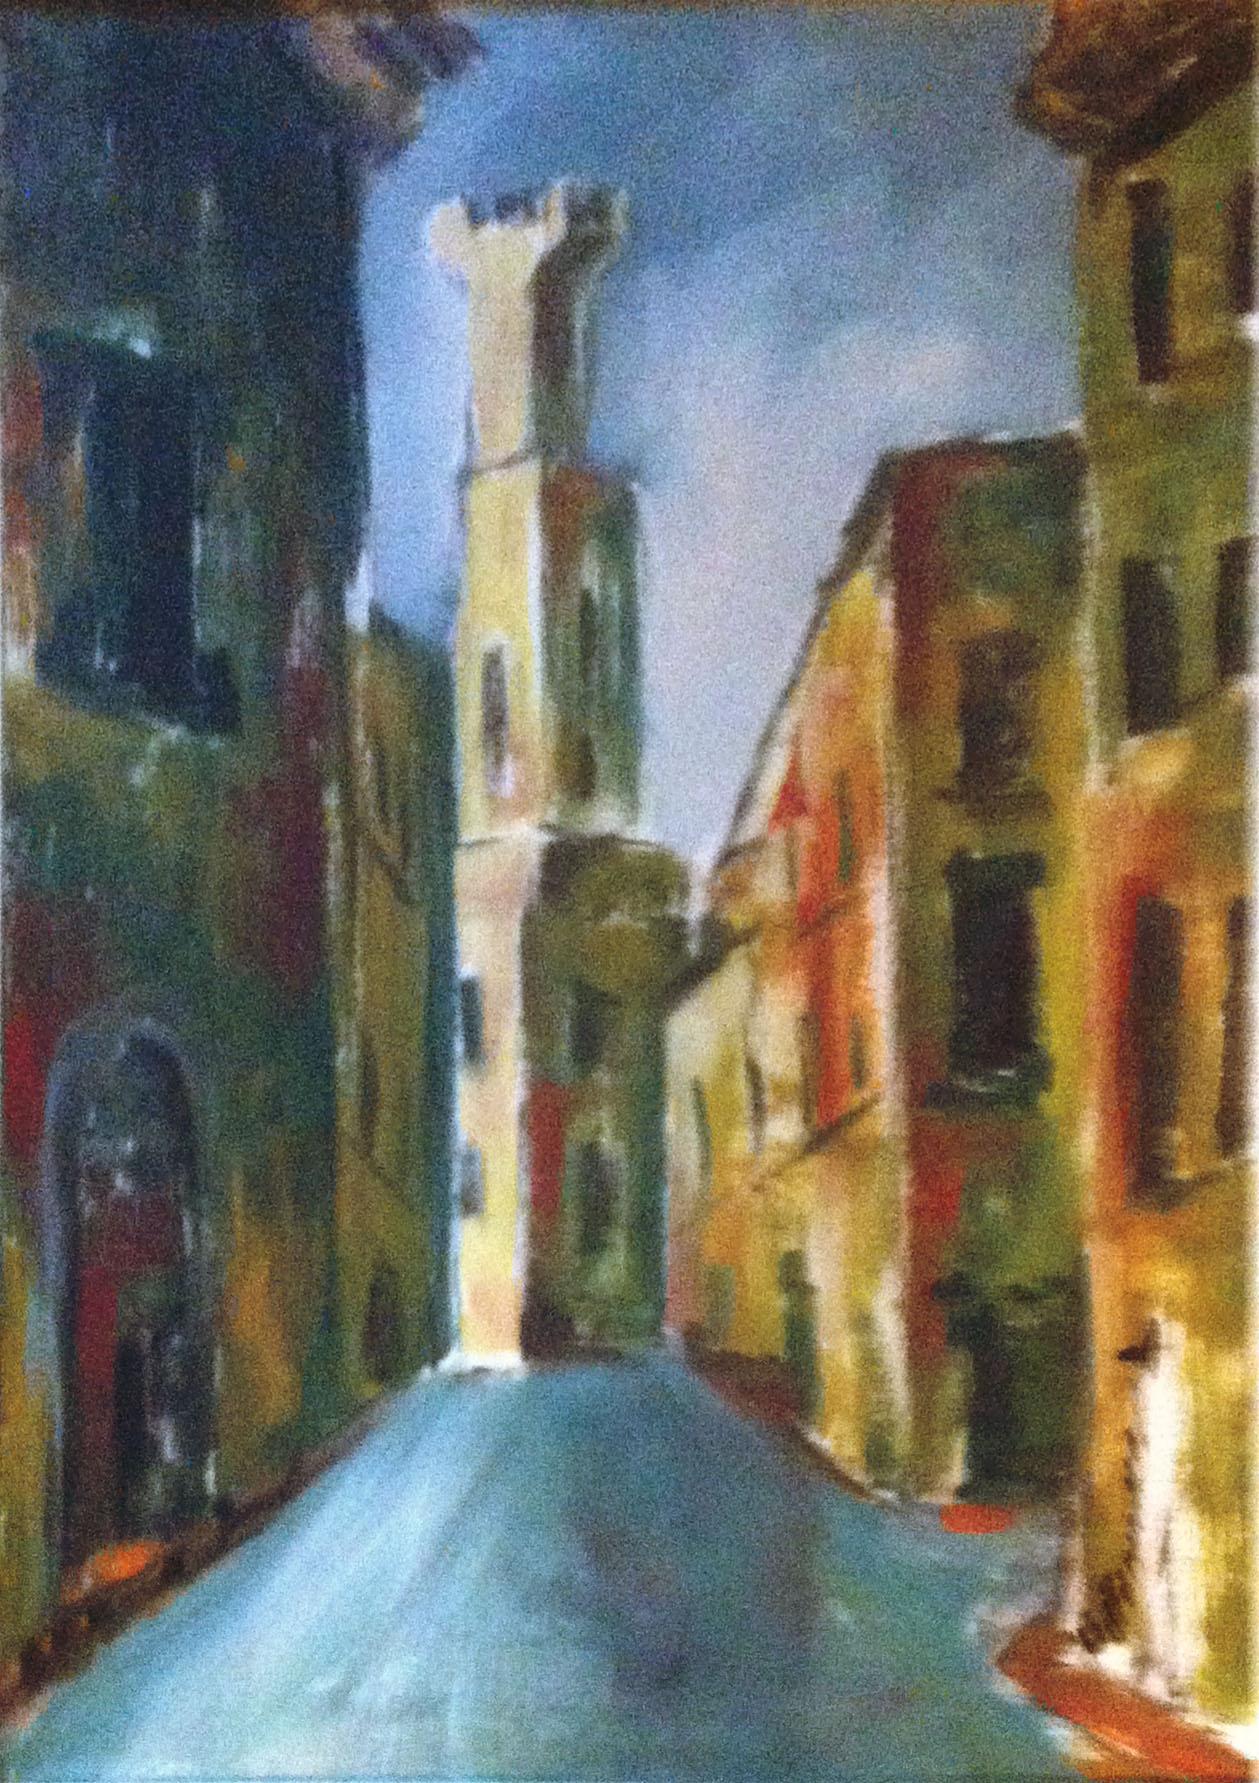 Gianfranco Autunnali – Senza titolo